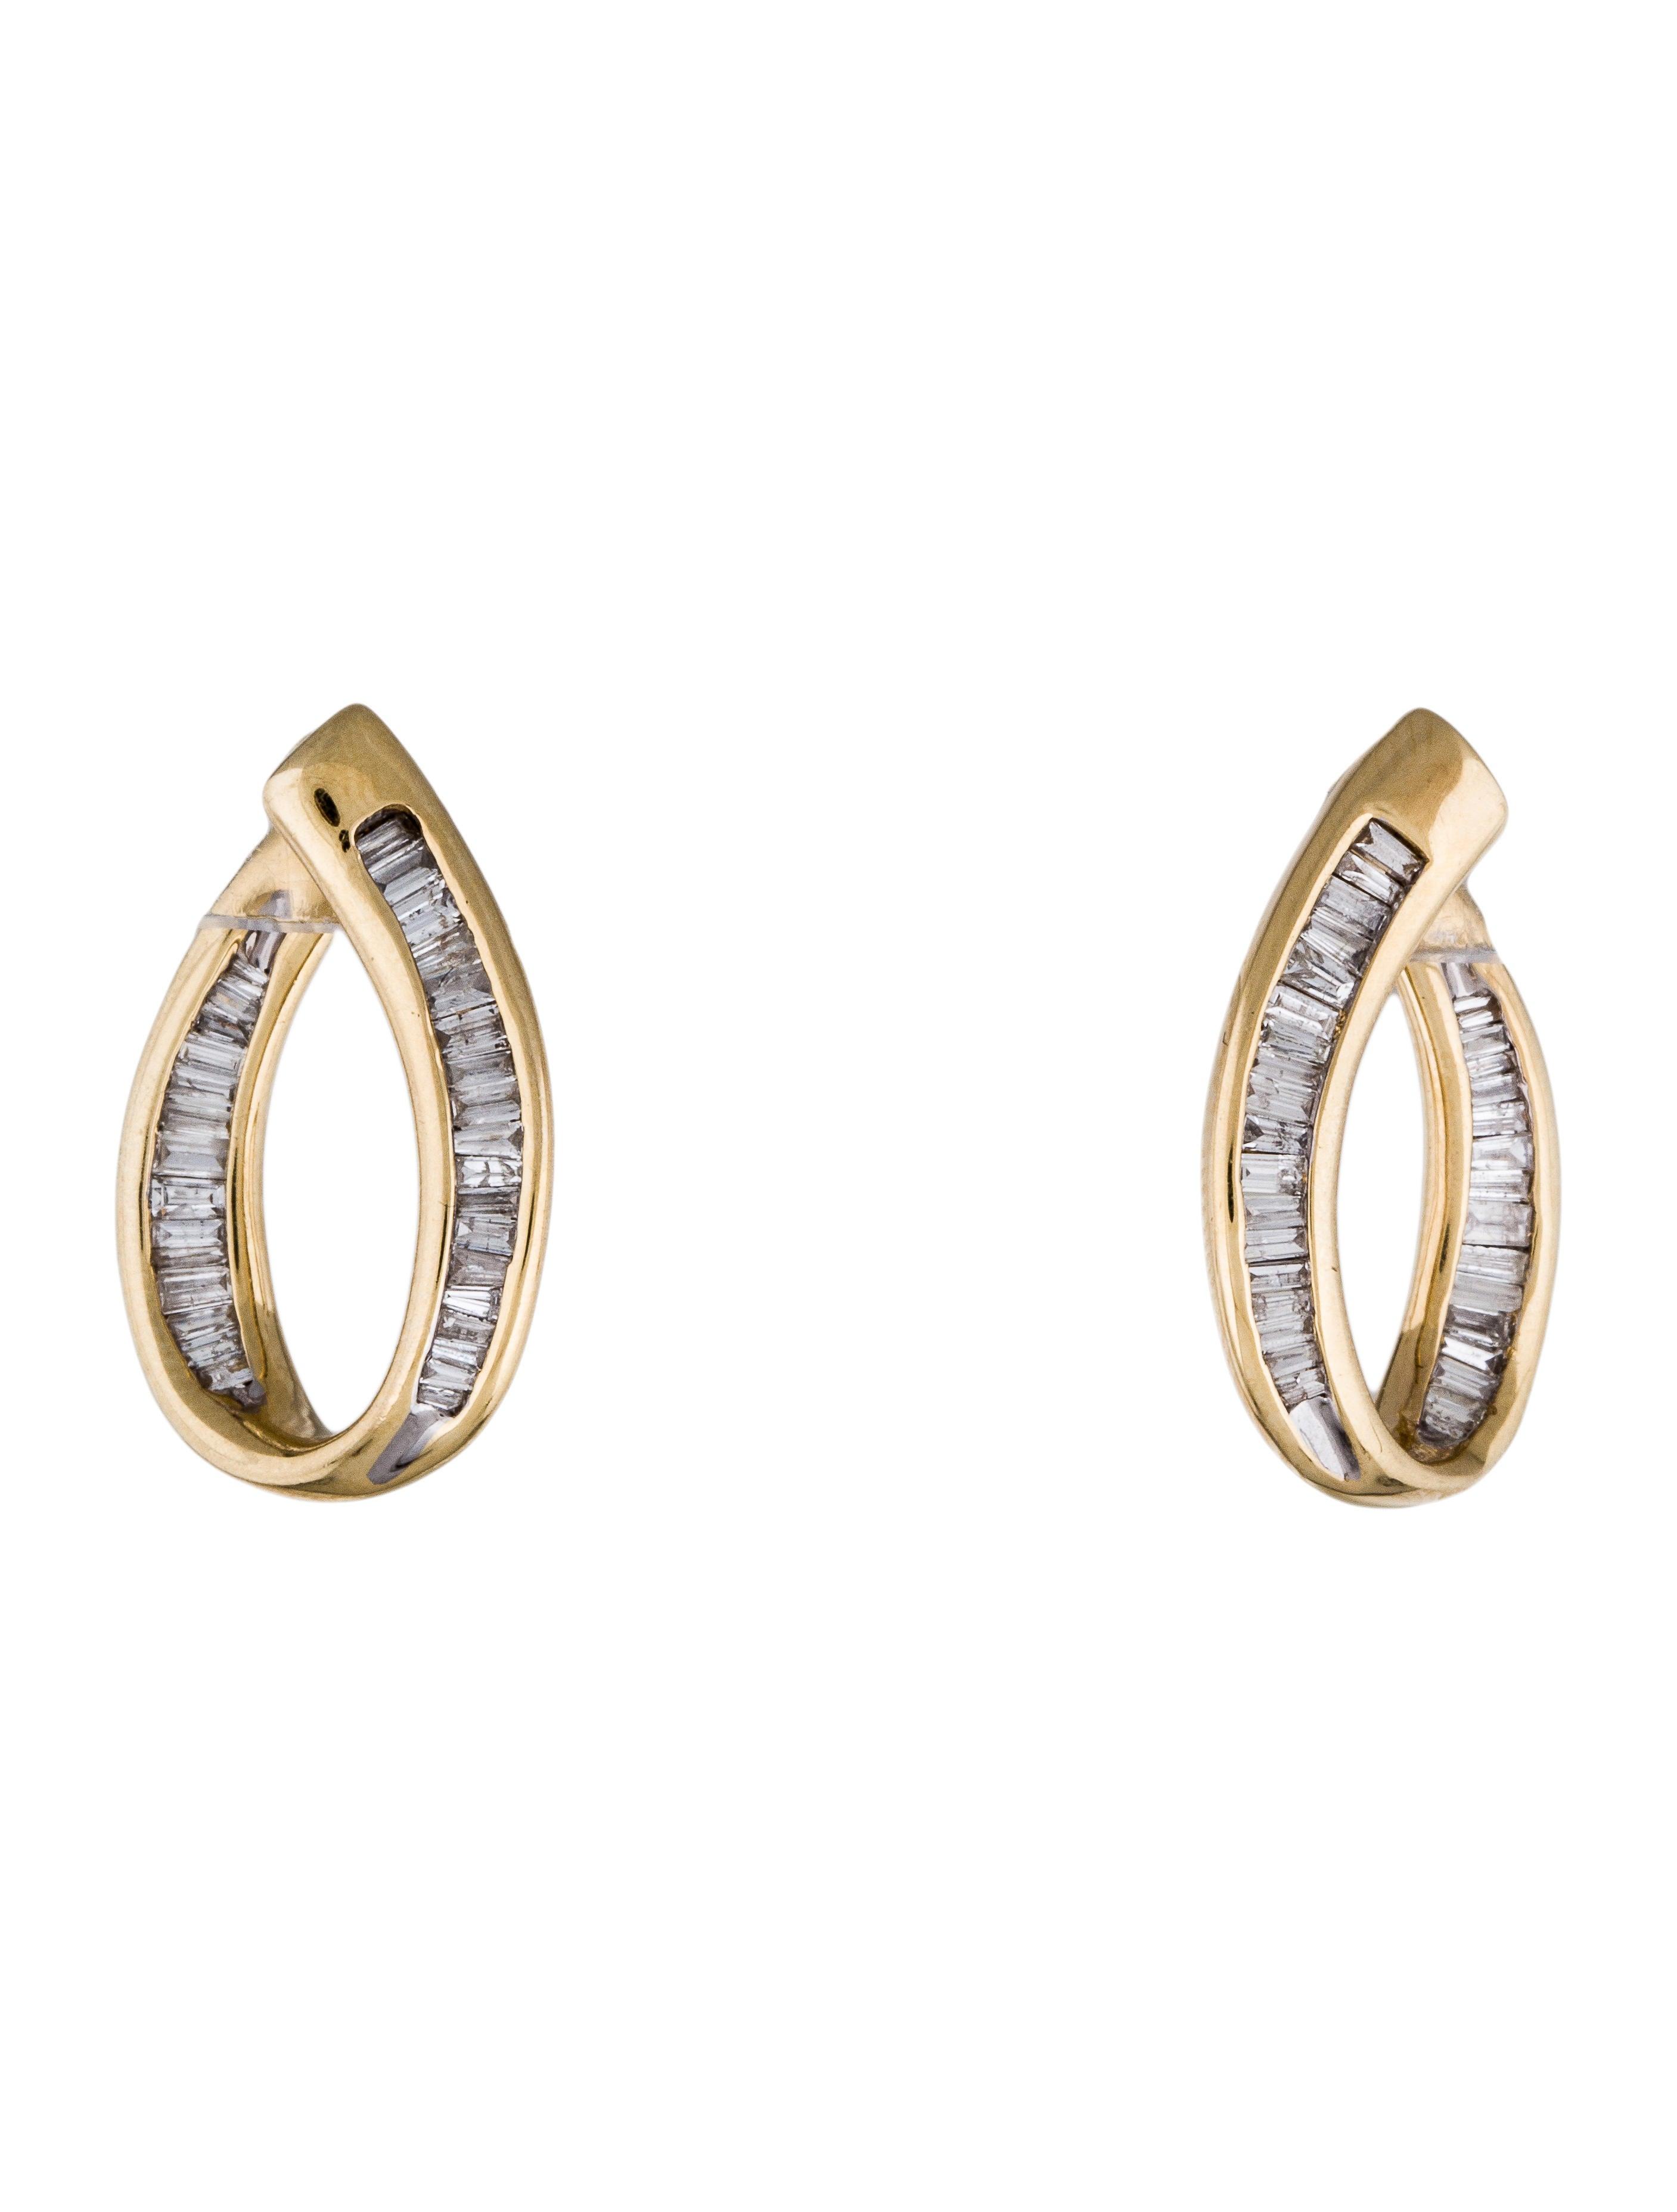 14k baguette diamond hoop earrings earrings earri28614. Black Bedroom Furniture Sets. Home Design Ideas